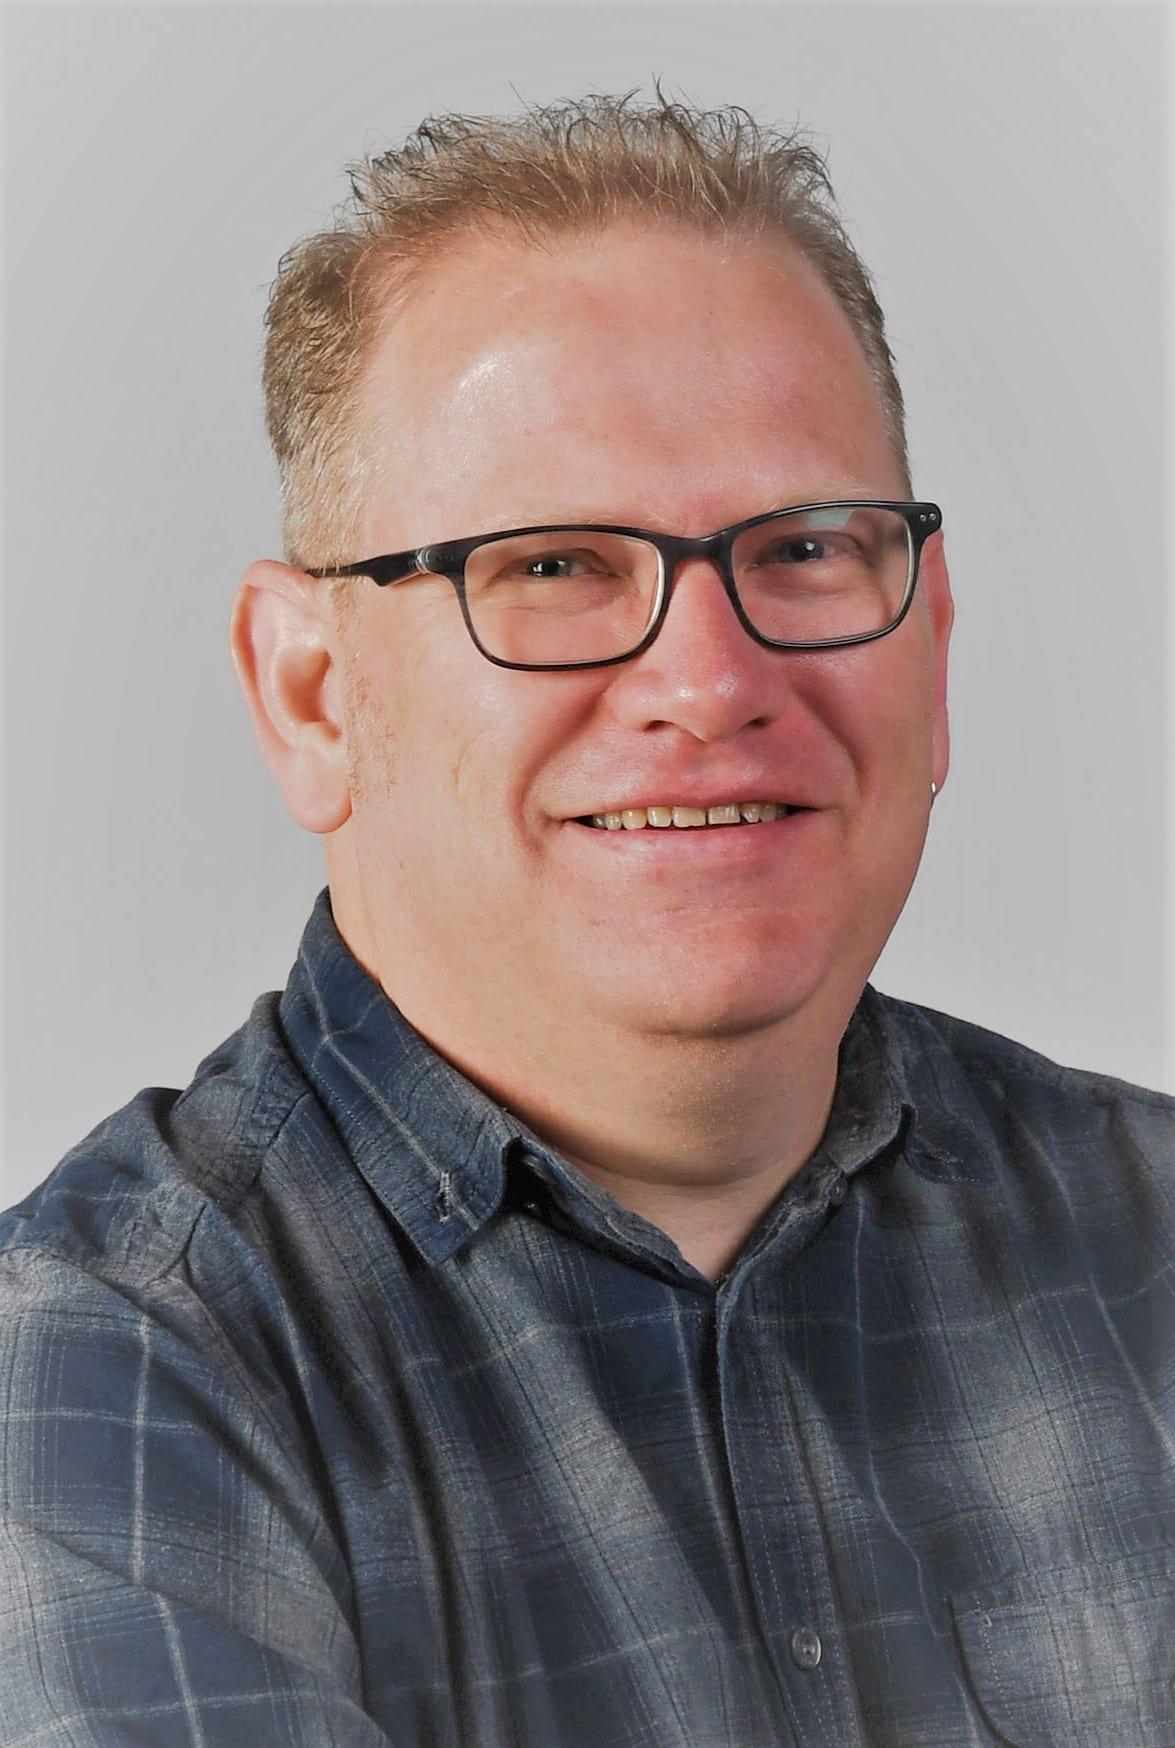 Brad Kruger - Media Education portrait - enhanced